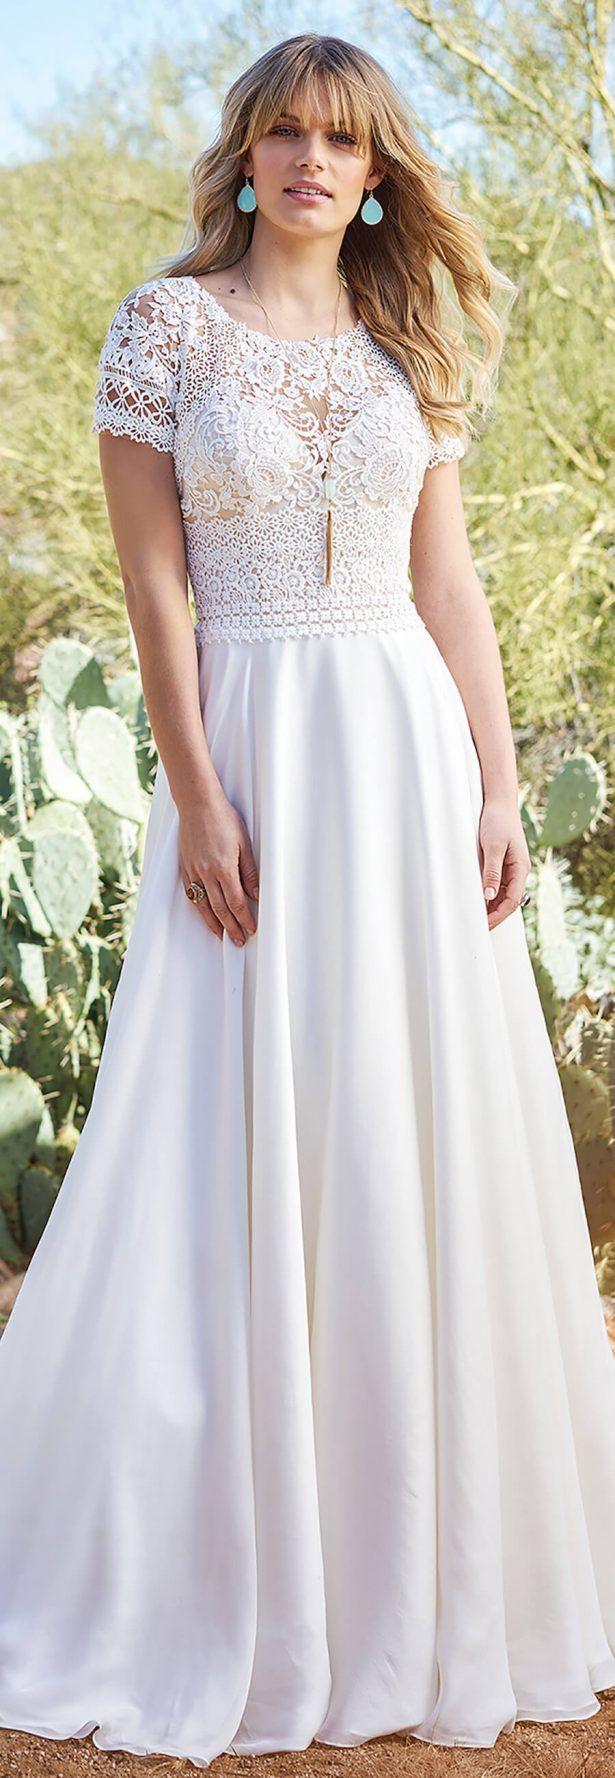 Lillian west wedding dress  Lillian West Wedding Dress Collection Spring   Lillian west